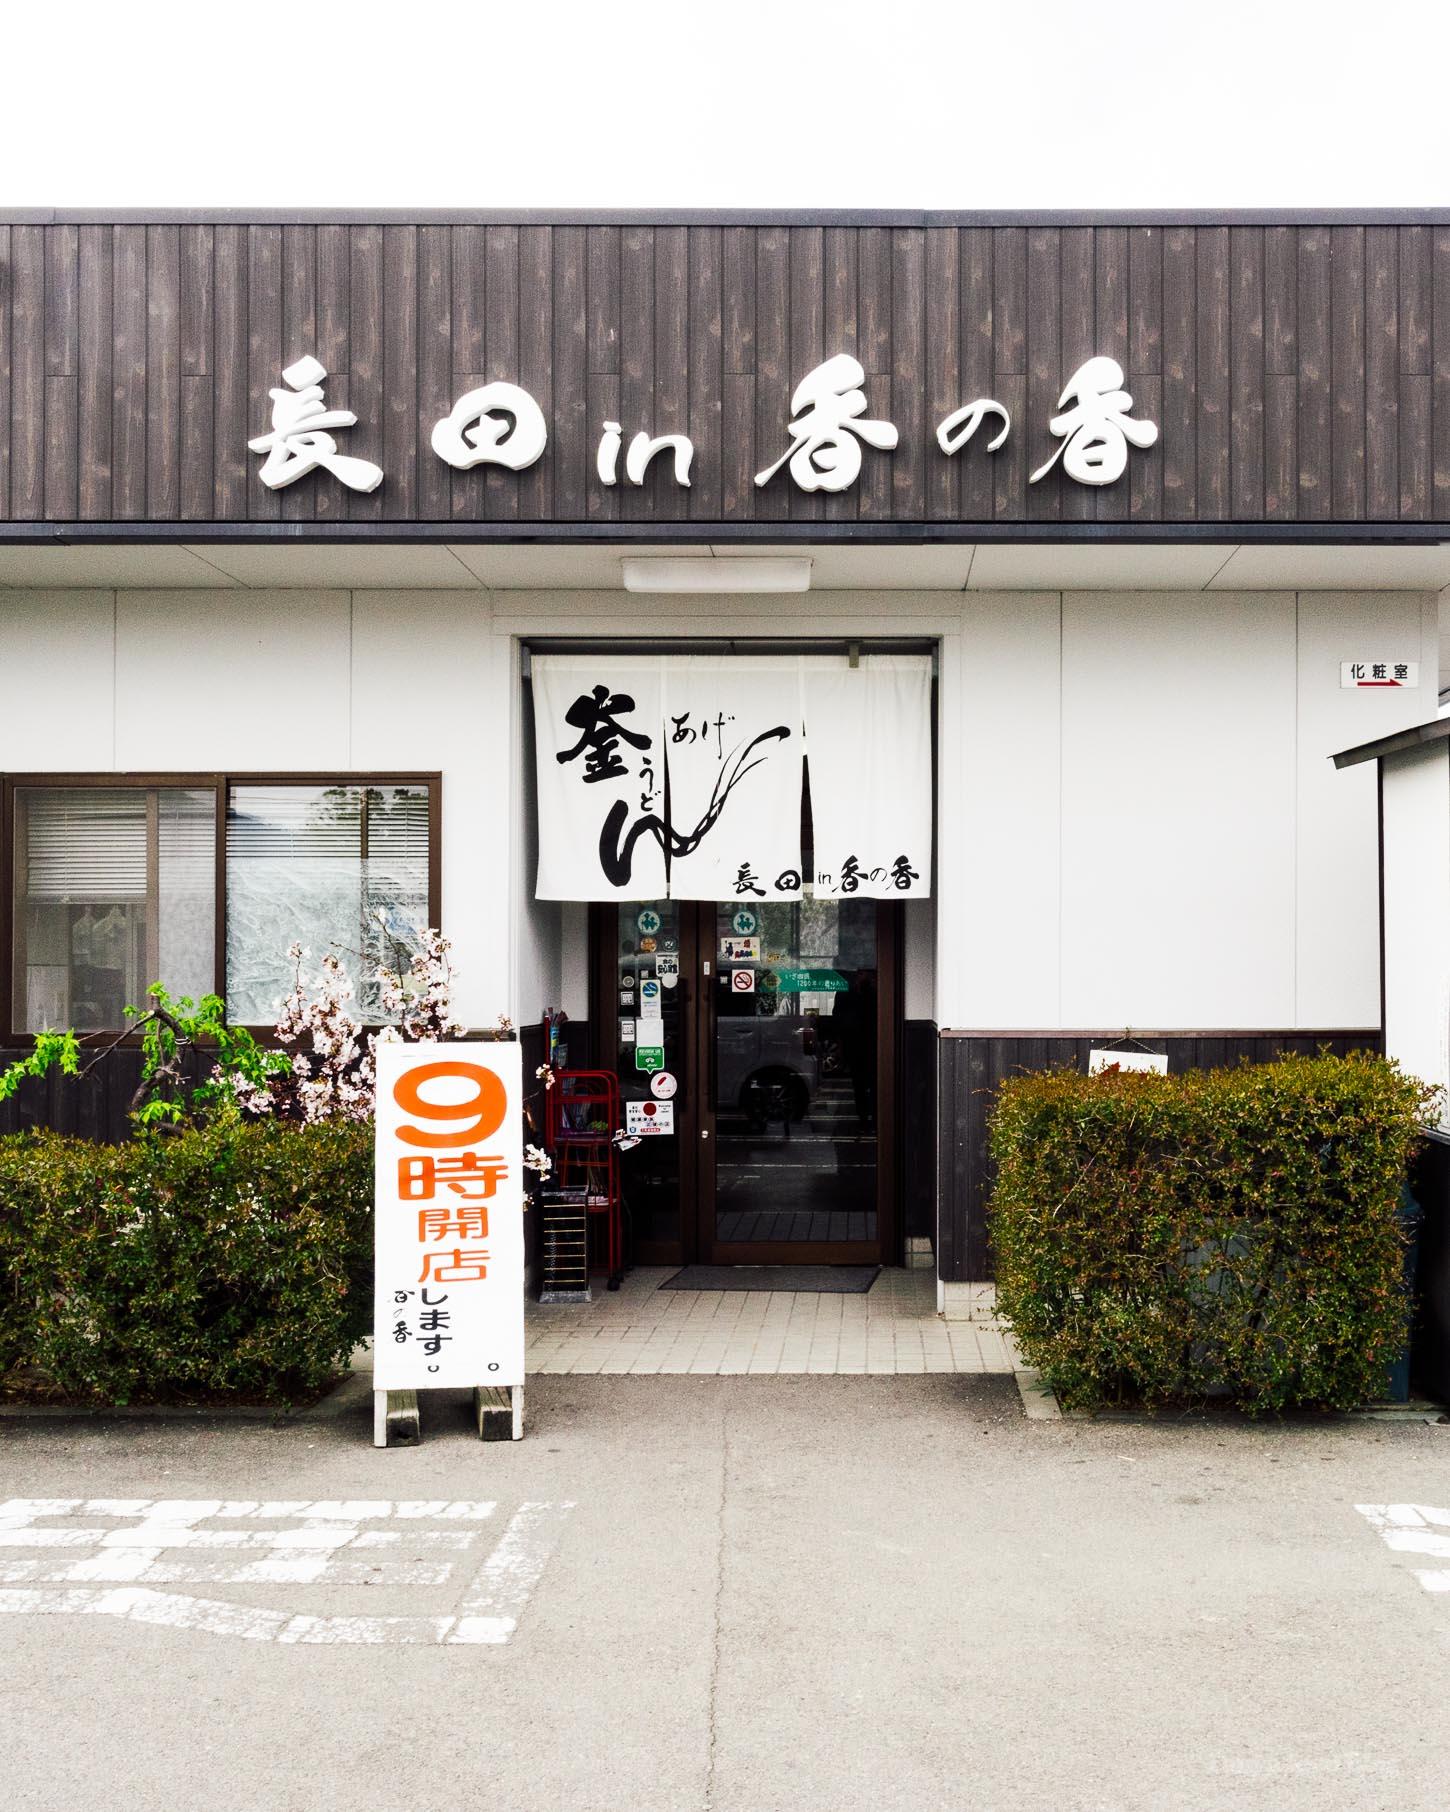 Nagata in Kanoka Review | www.iamafoodblog.com